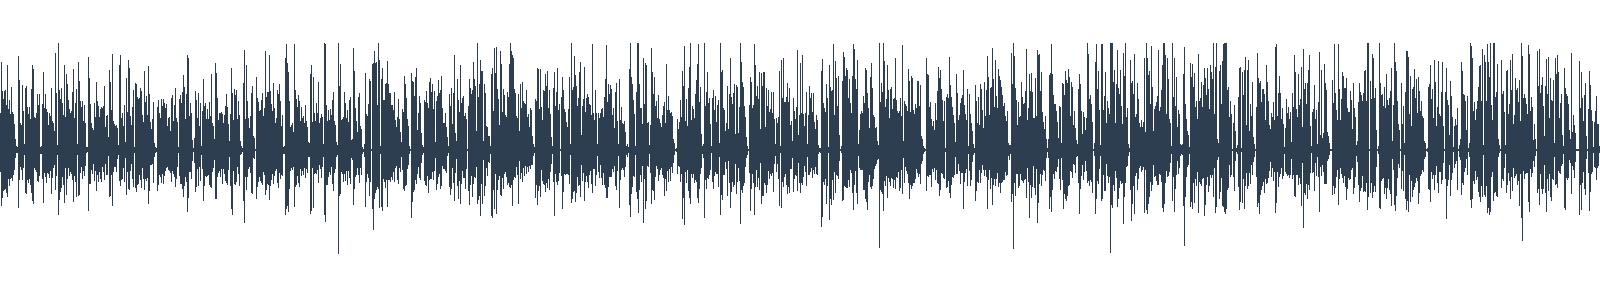 Lüneburský variant waveform